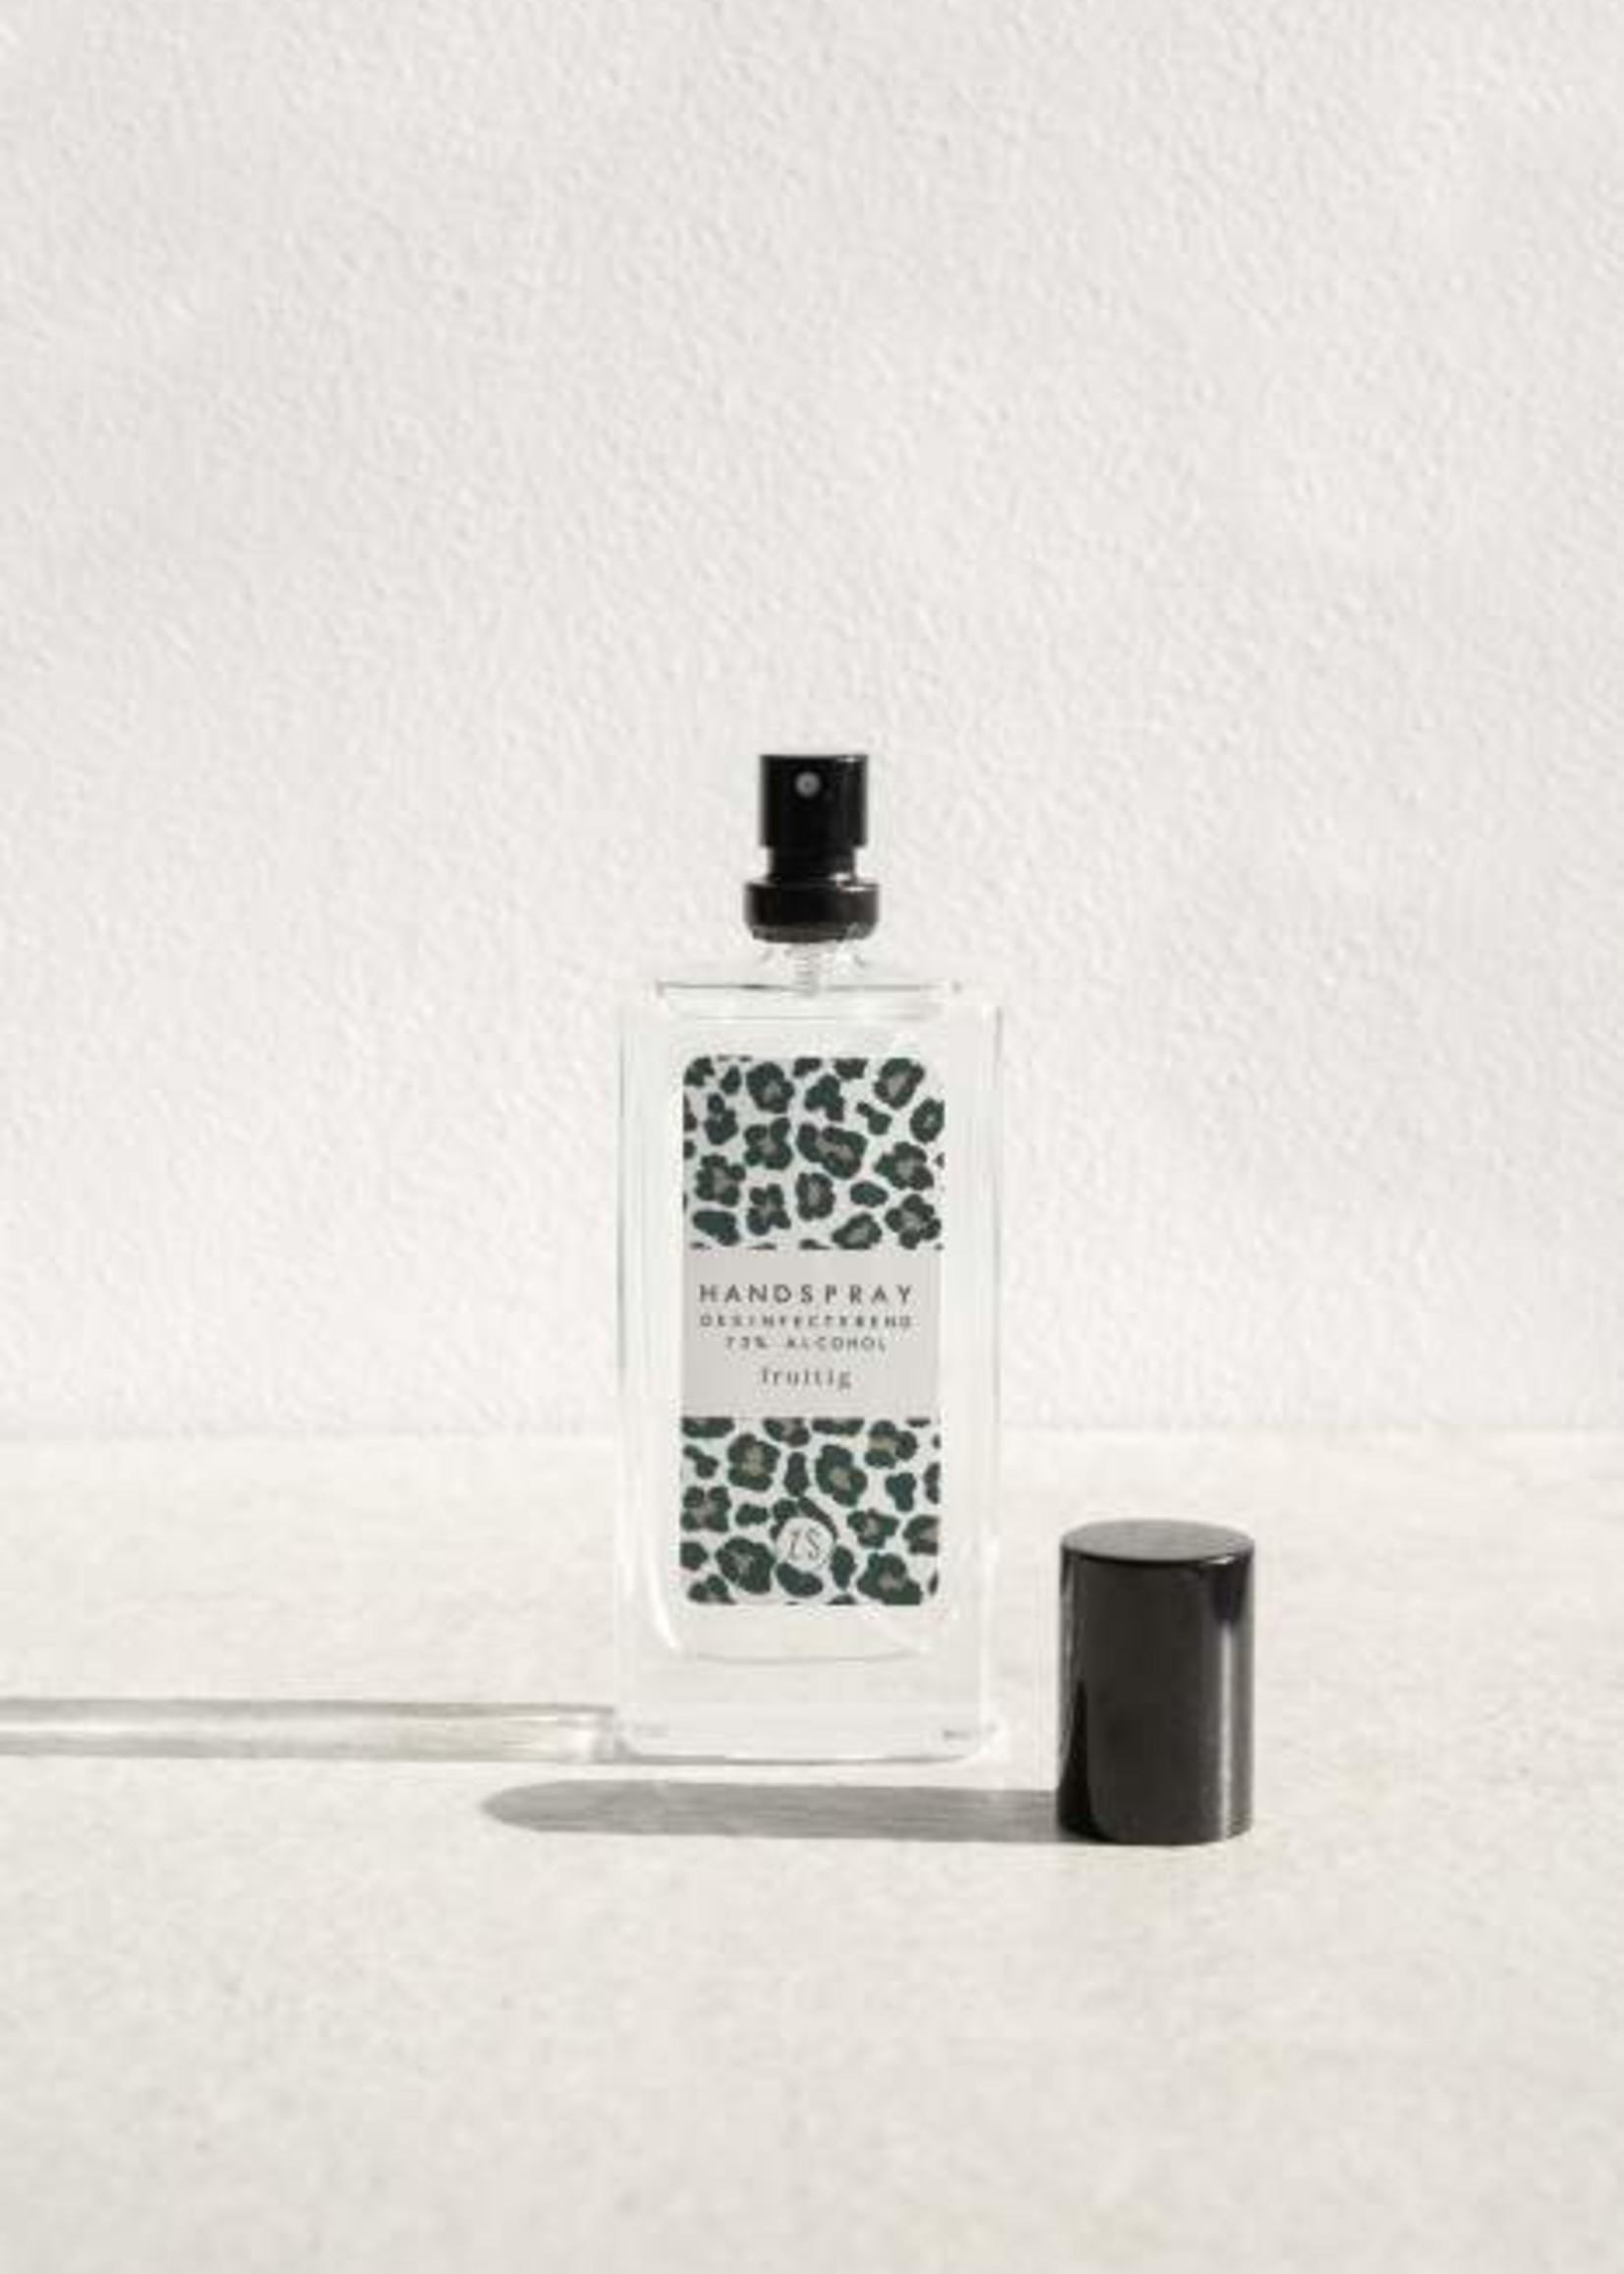 ZUSSS Desinfecterende handspray met geur kruidig